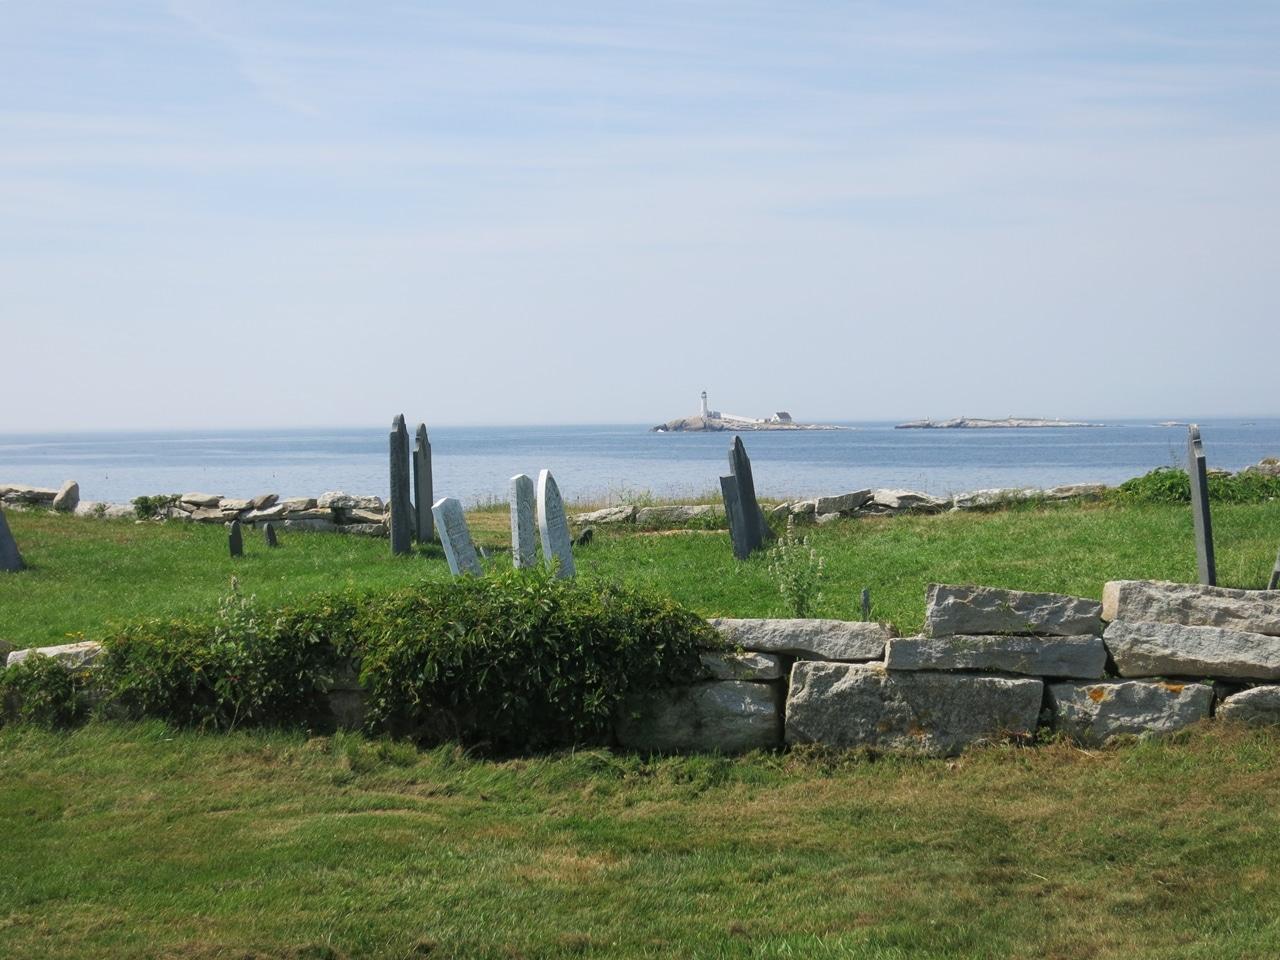 Star Island Graveyard